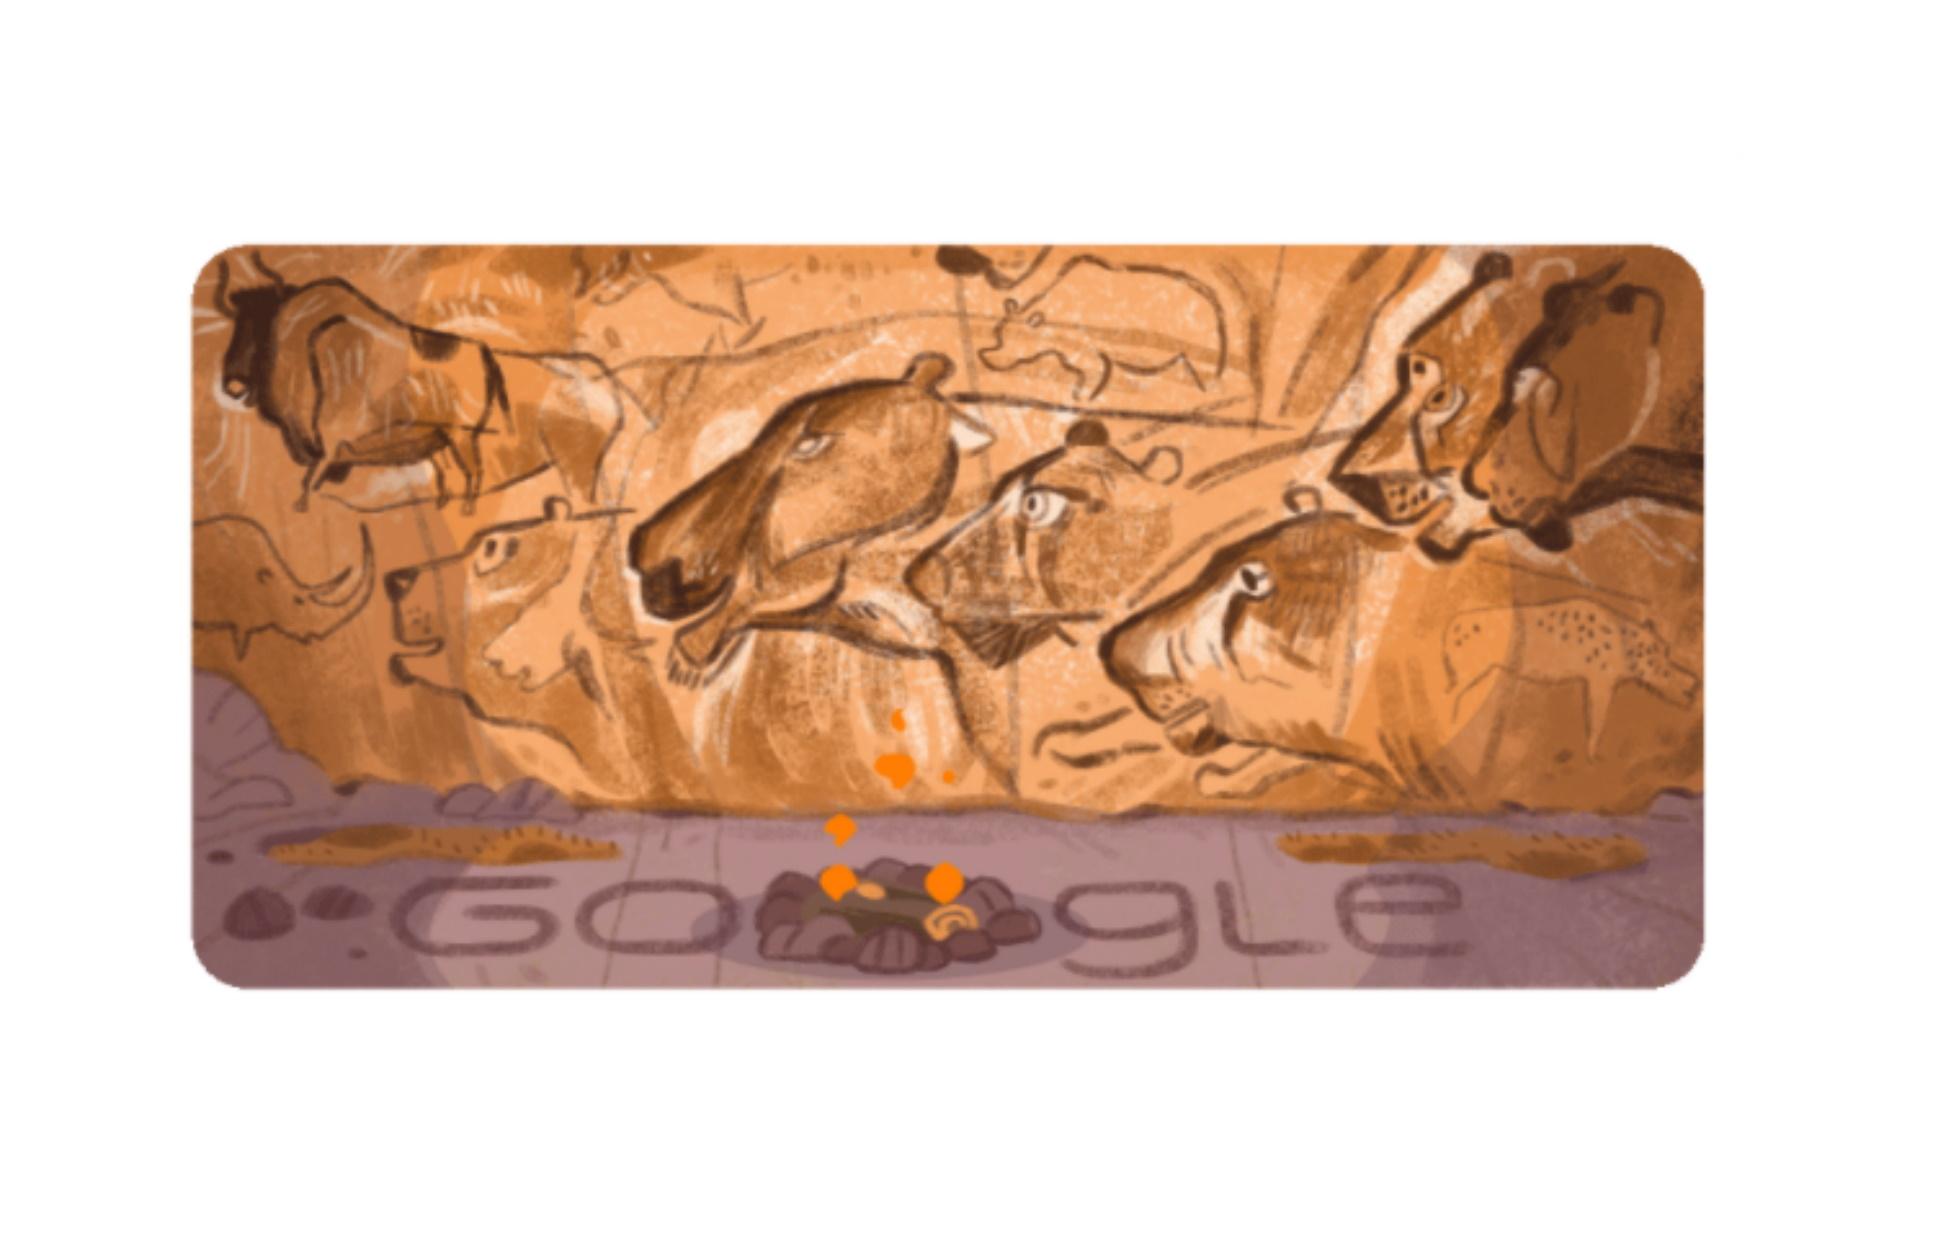 H Ανακάλυψη Σπηλαίου Σωβέ και η απίστευτη ιστορία που το έκανε να ξεχωρίζει